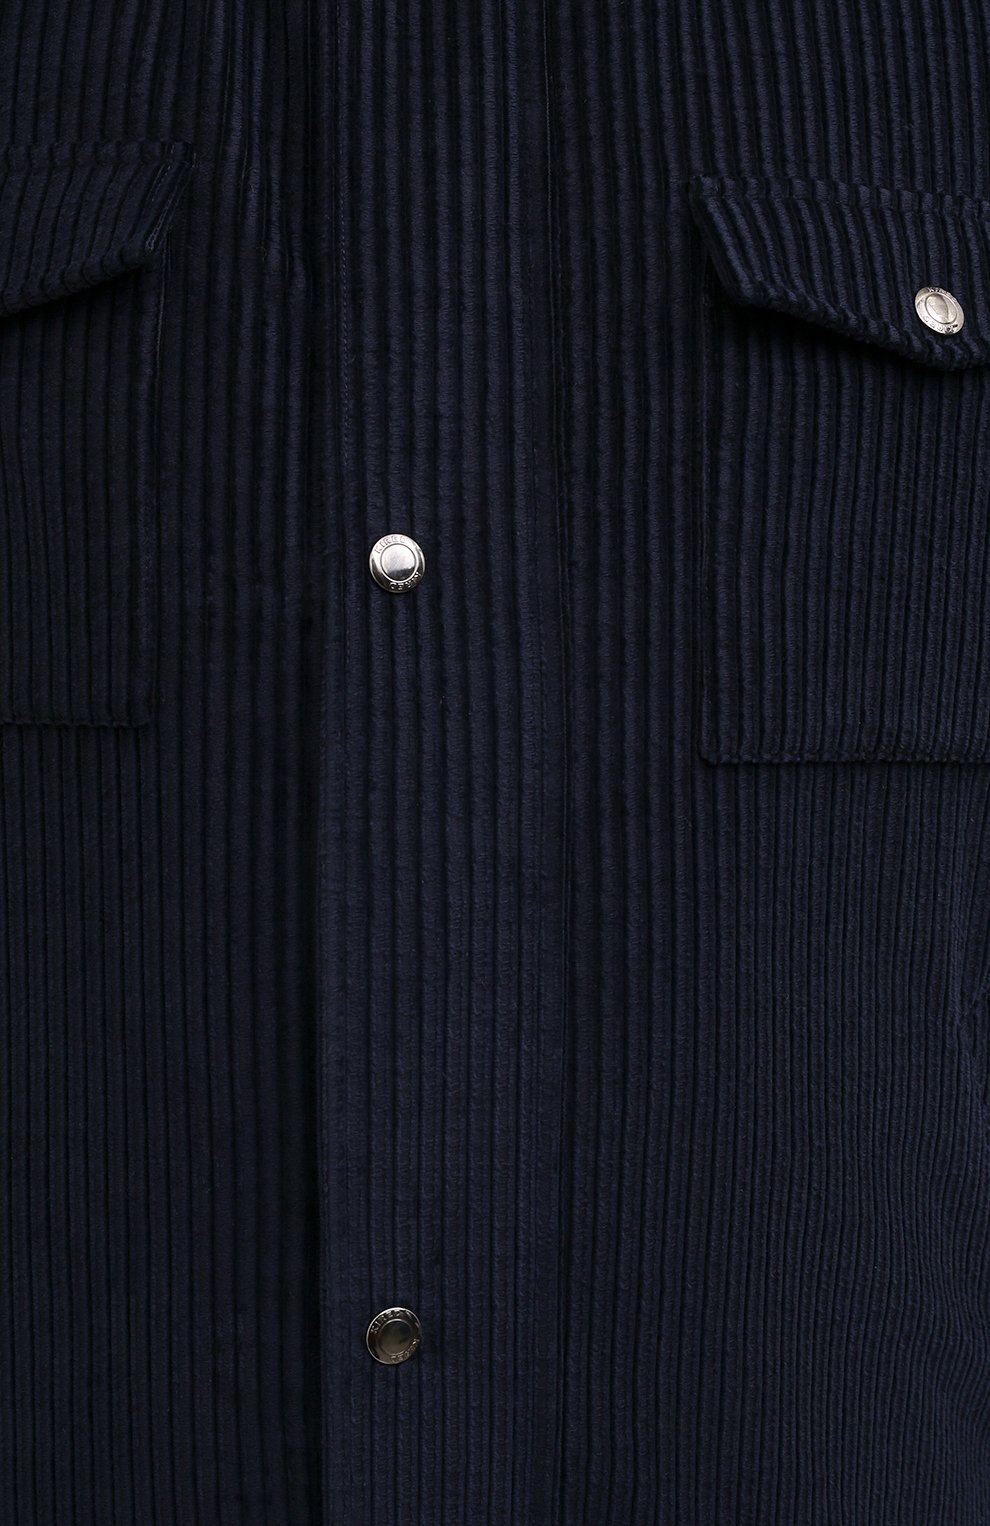 Мужской пуховый жилет KIRED синего цвета, арт. WBEARW7204001000/62-72 | Фото 5